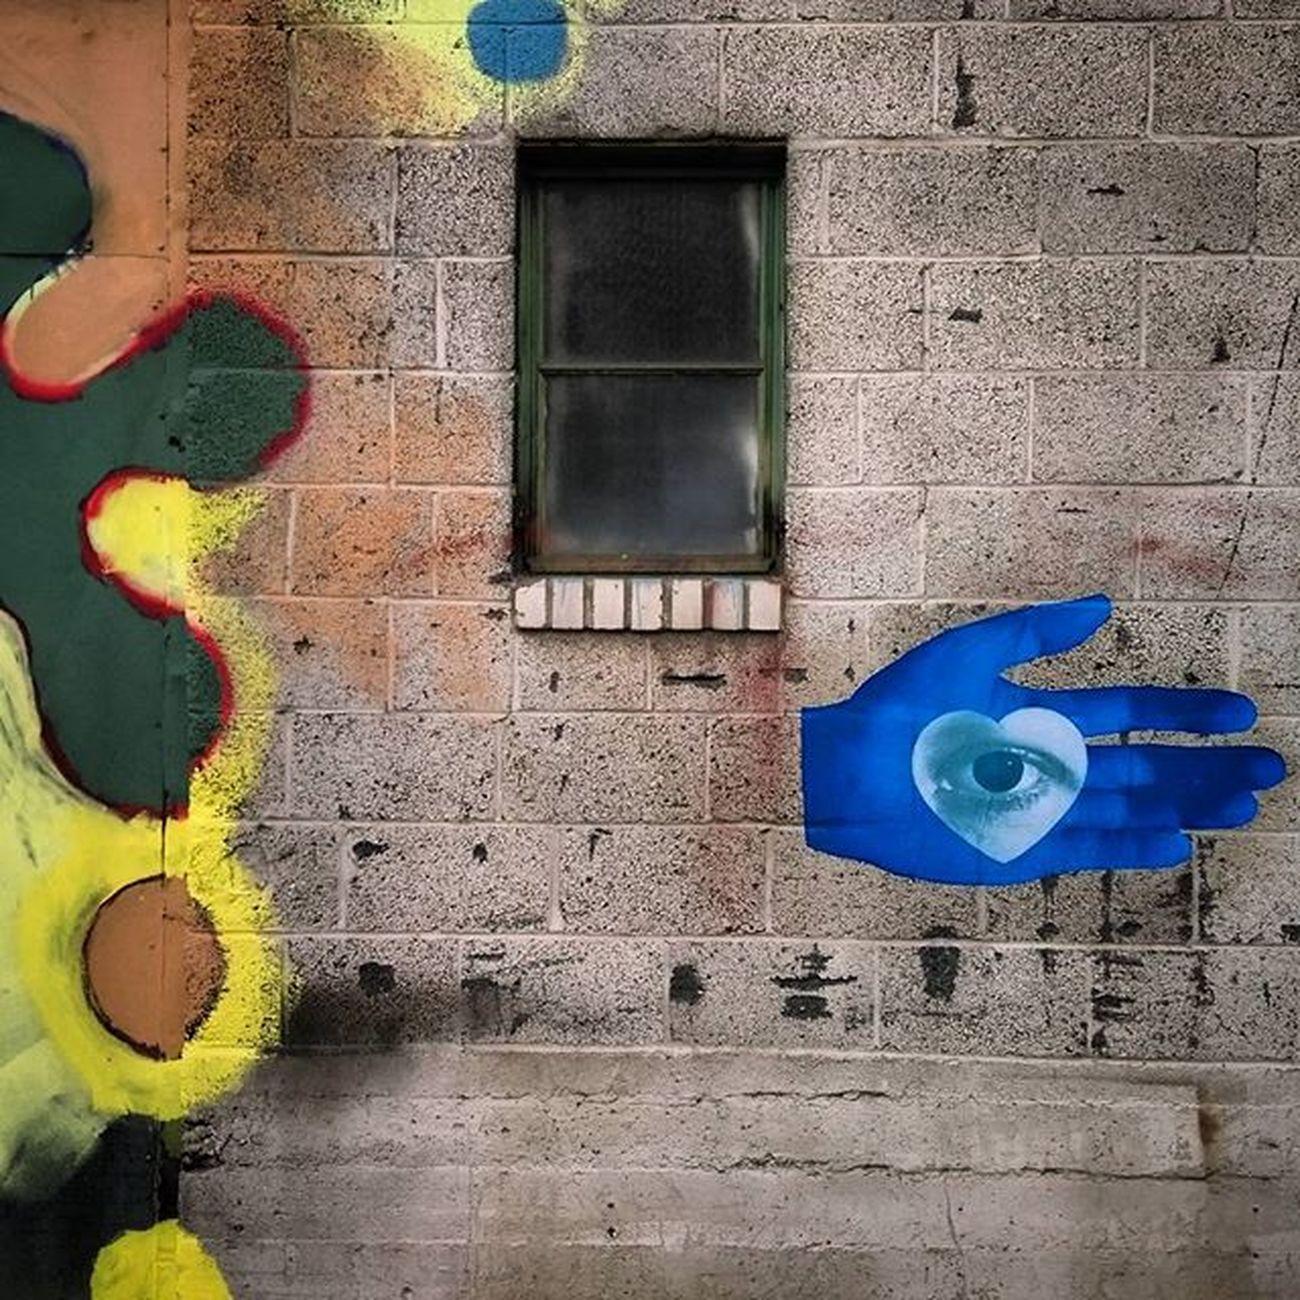 Streetart Denverstreetart Wheatpaste Pasteup Graffhunter Graffiti Denvergraffiti Kokobayer Kokobayerart Herbertbayer